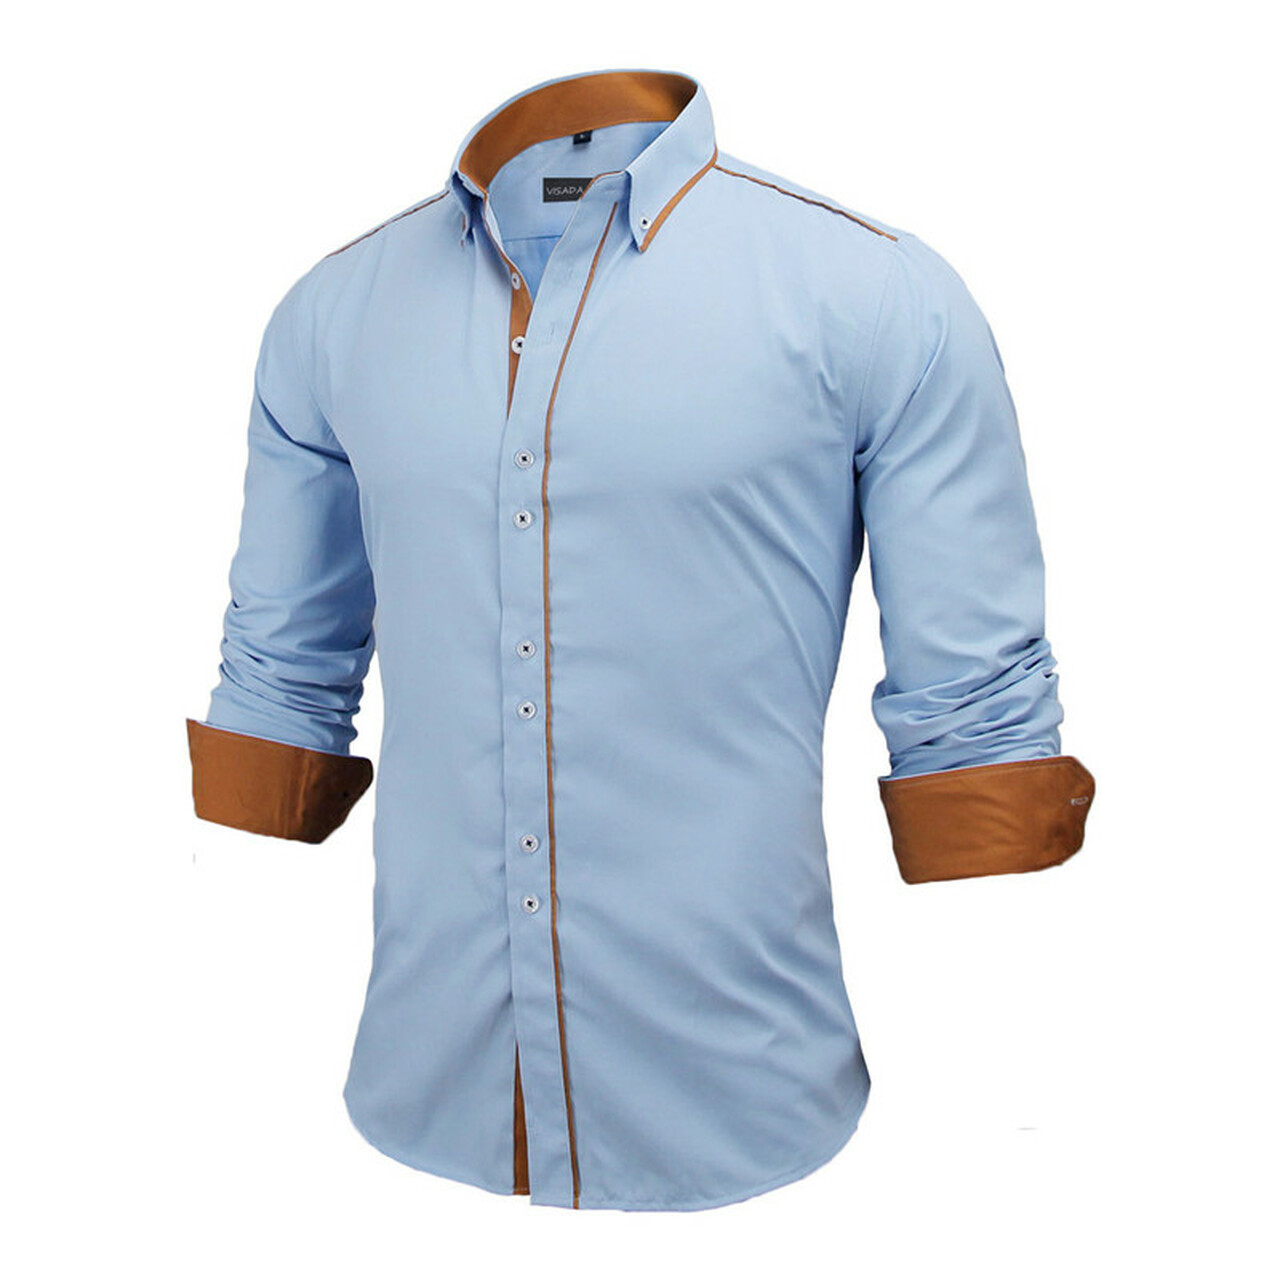 f0b53d1e42bc ... VISADA JAUNA Men Shirts Europe Size New Arrivals Slim Fit Male Shirt  Solid Long Sleeve British ...